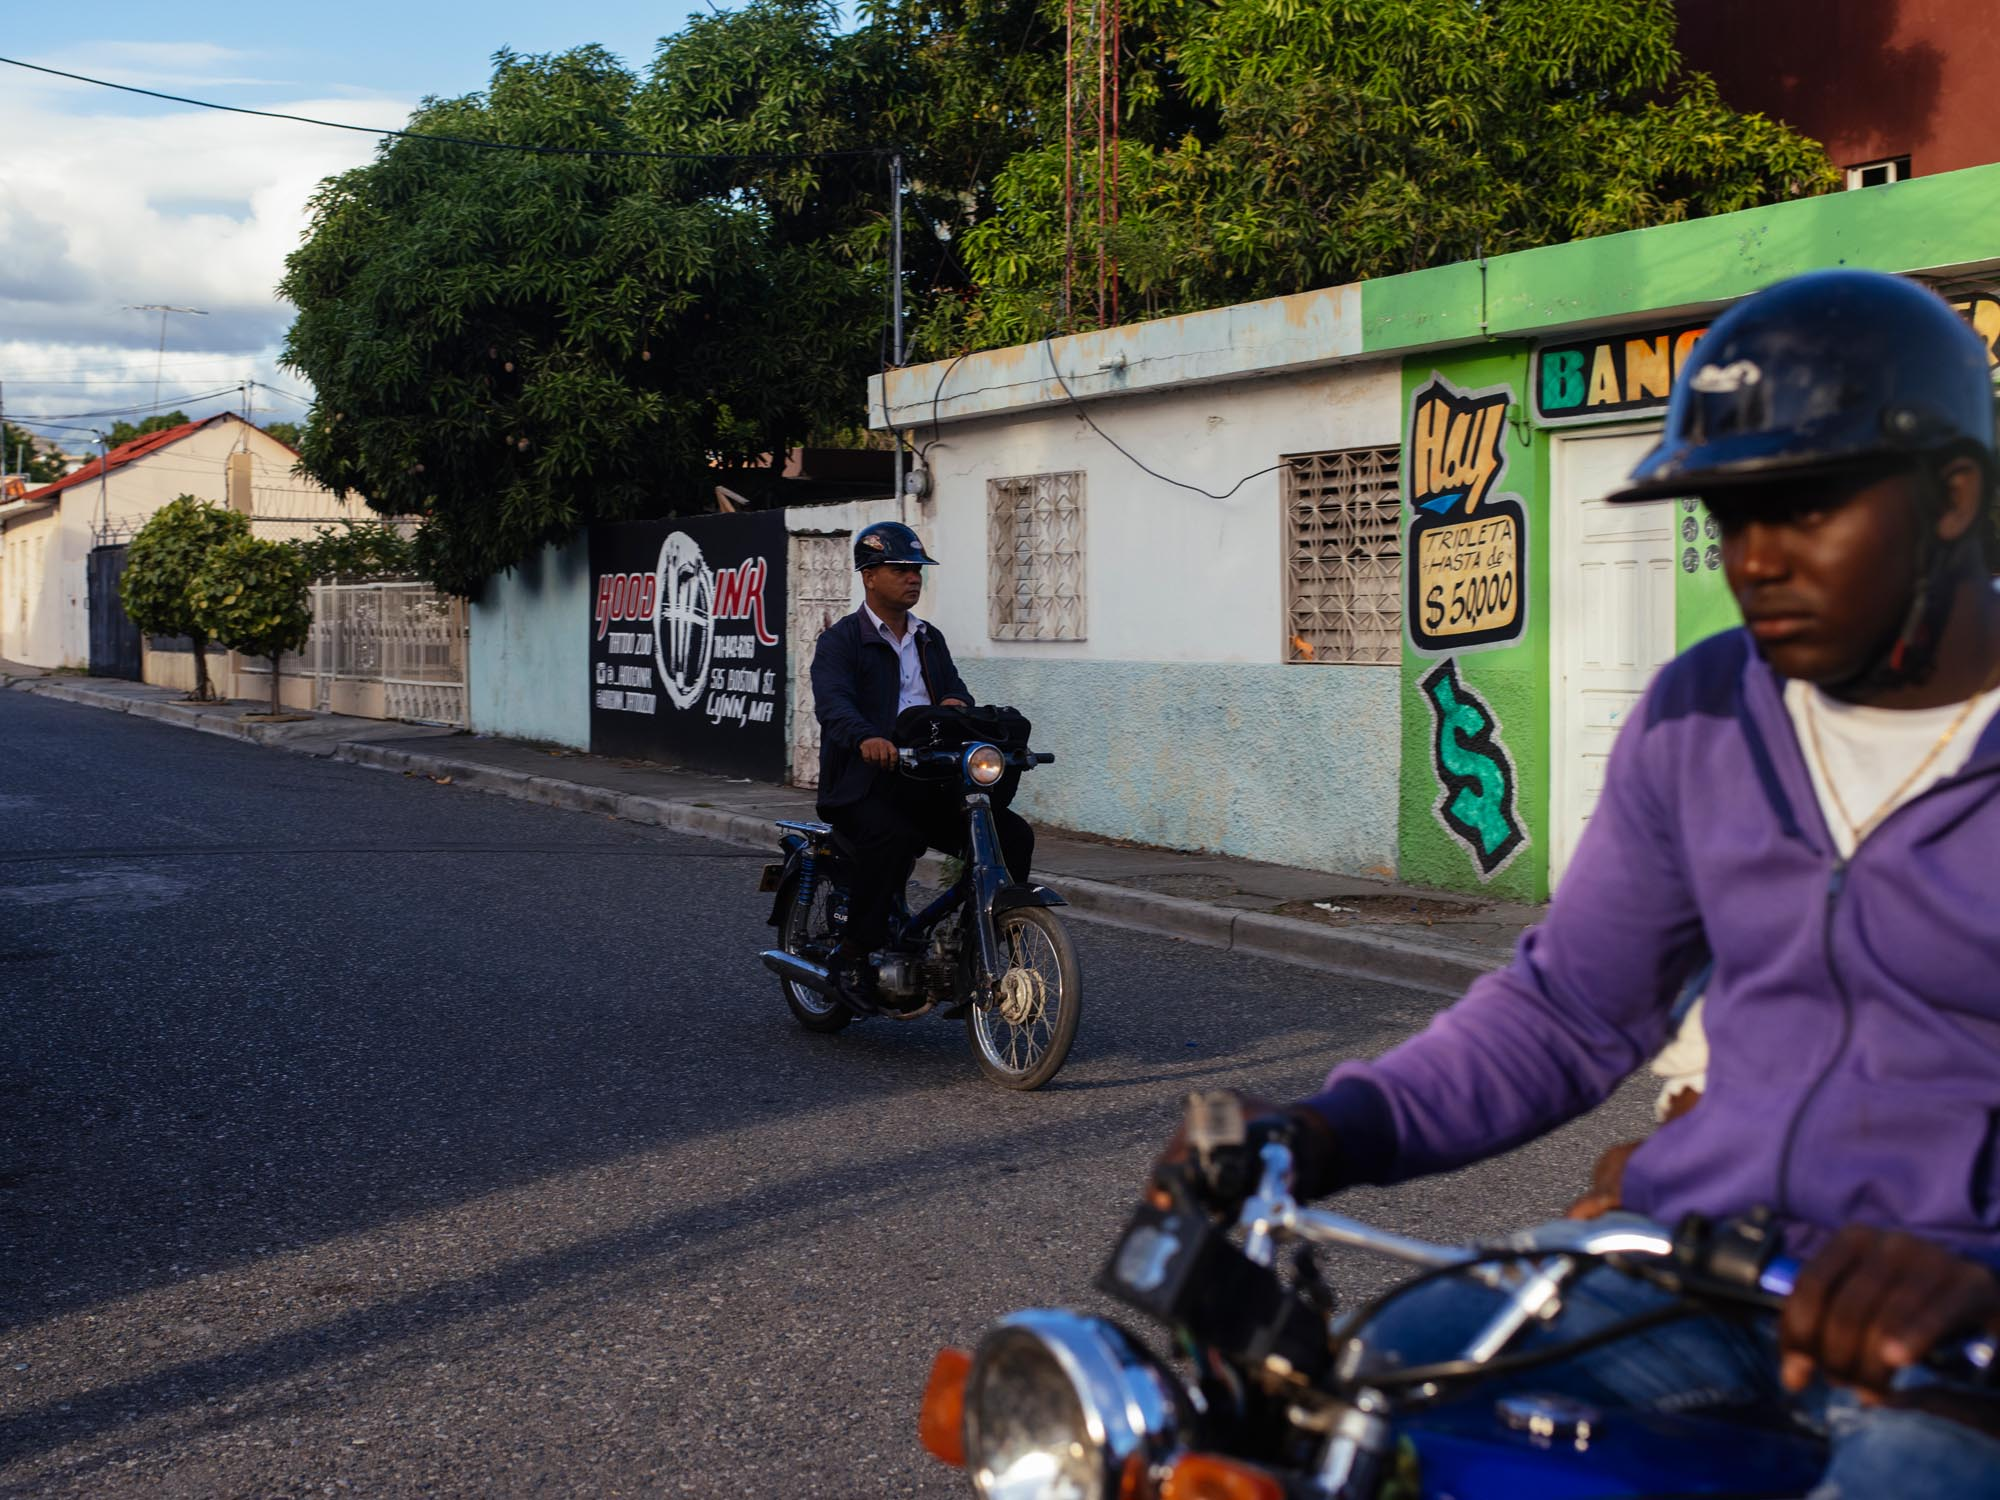 joris-hermans-photography-postcards-dominican-republic-motorcycles.jpg